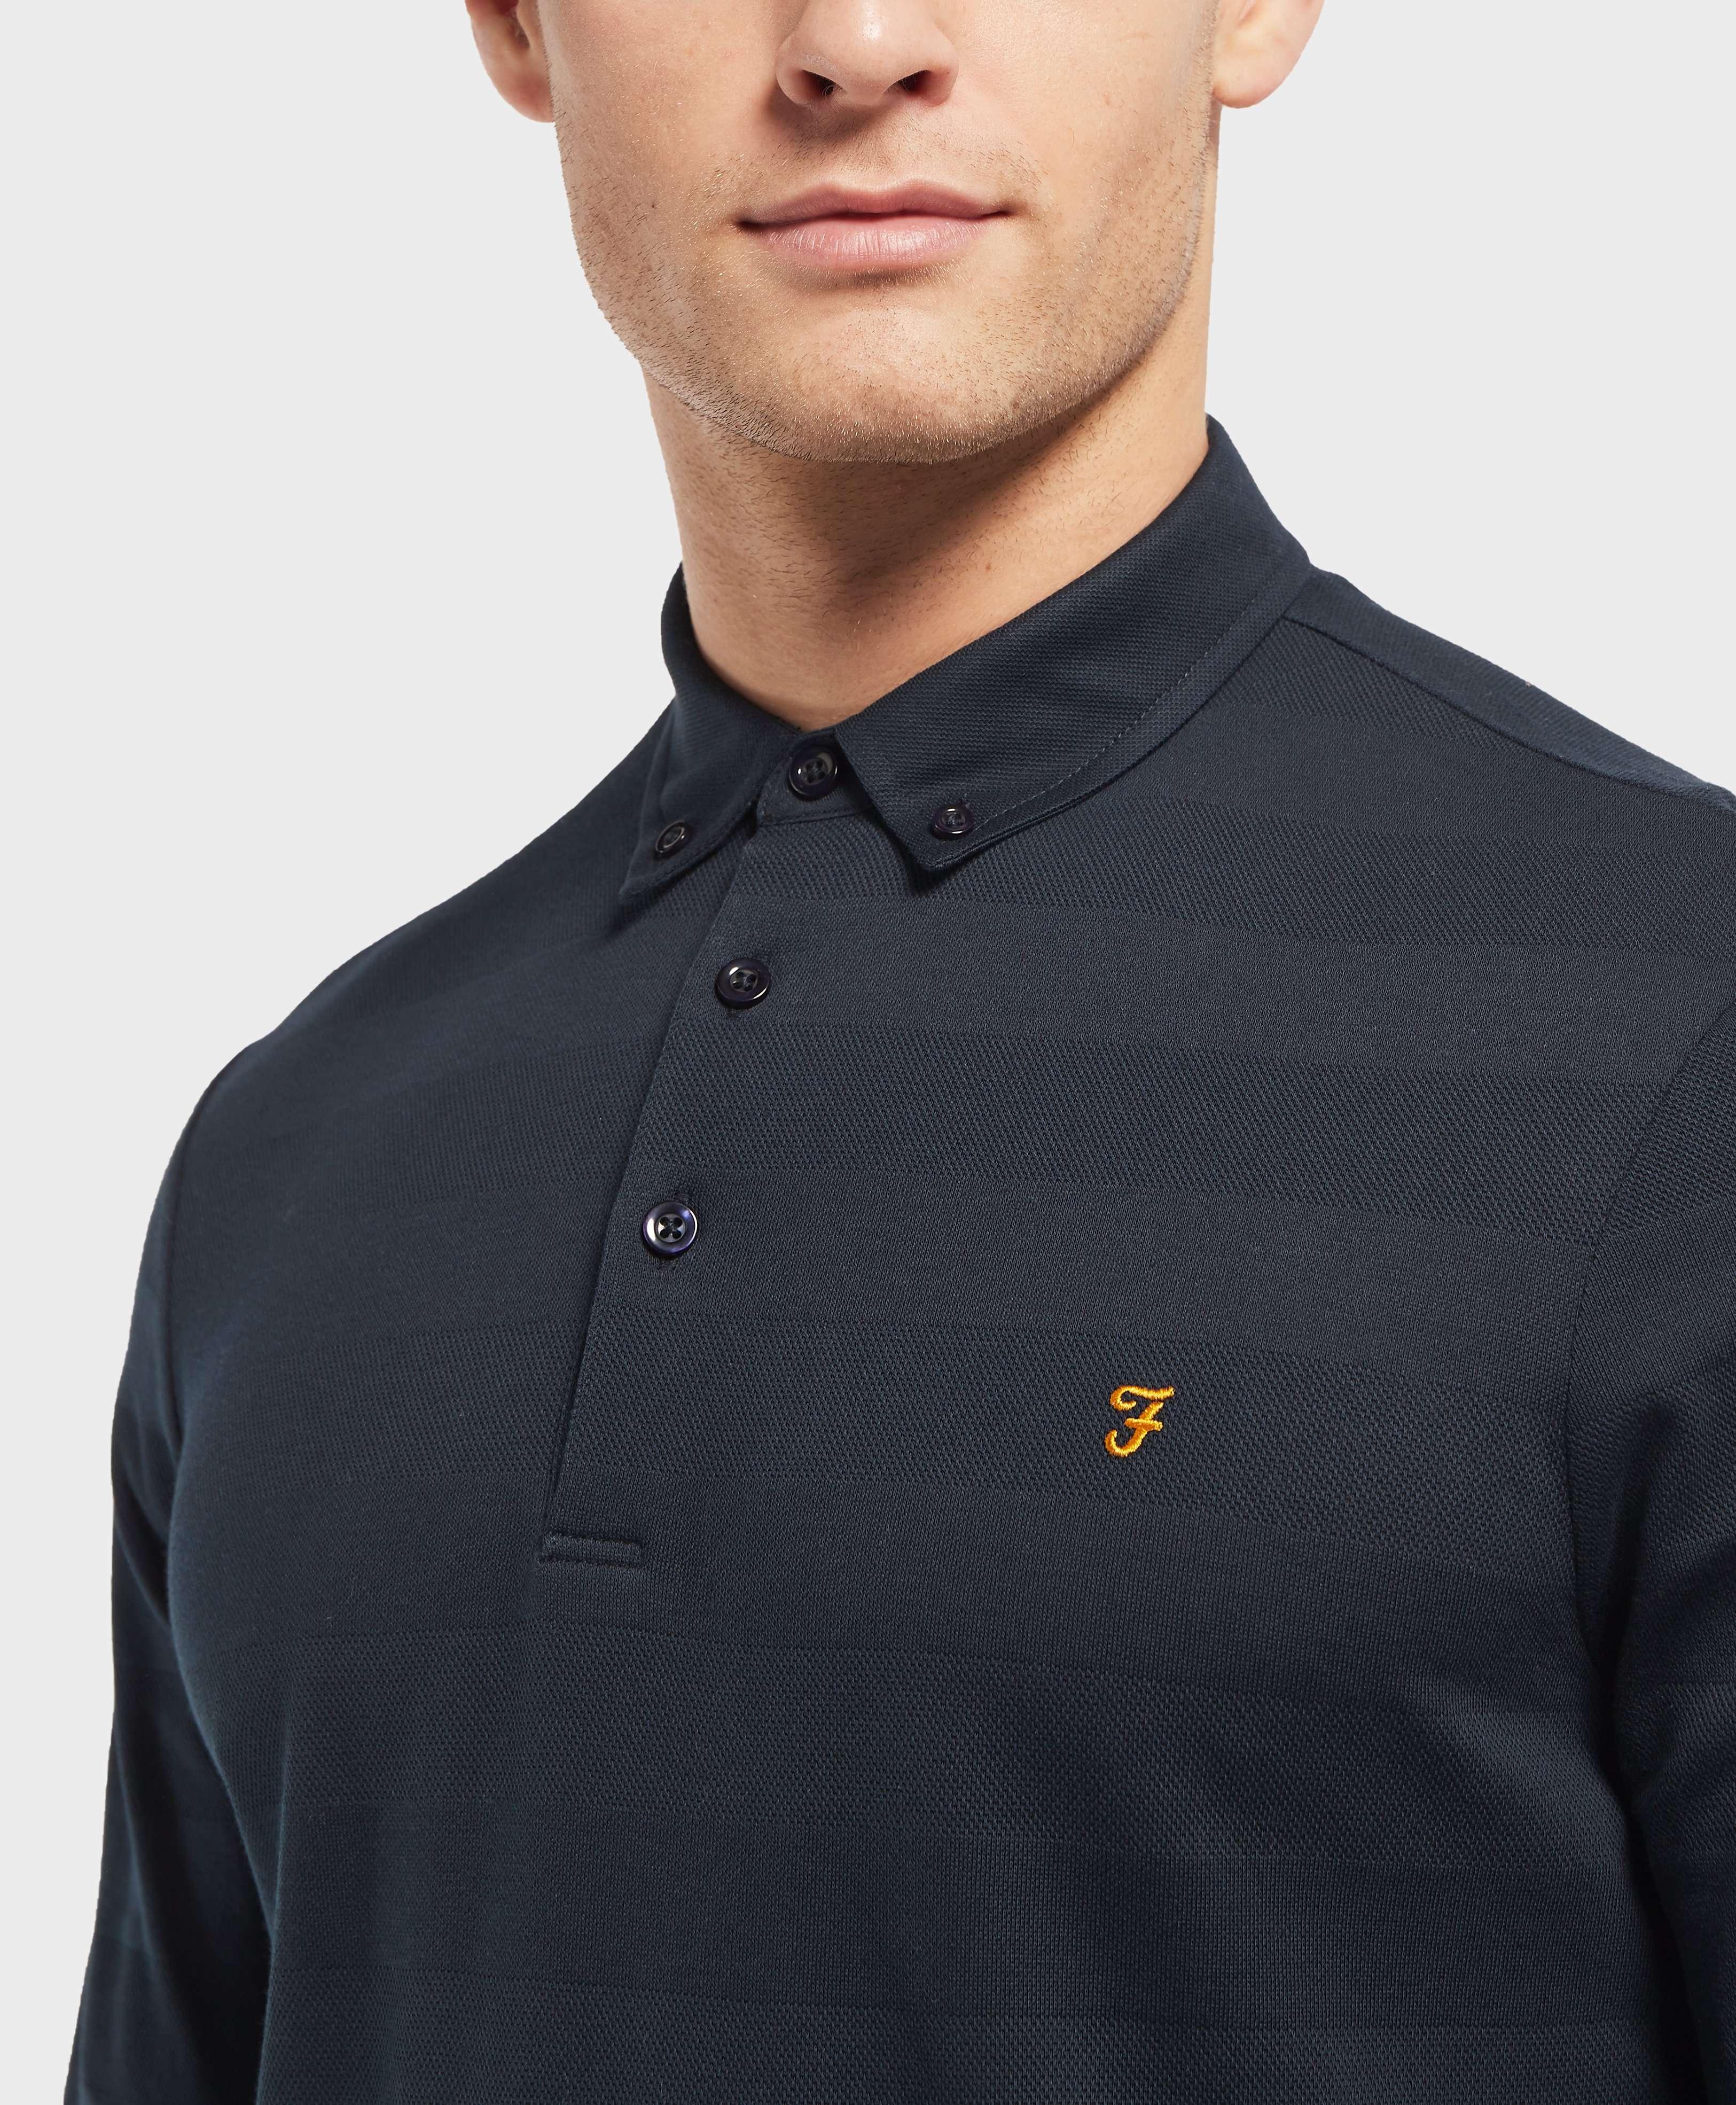 Farah Long Sleeve Polo Shirt - Online Exclusive